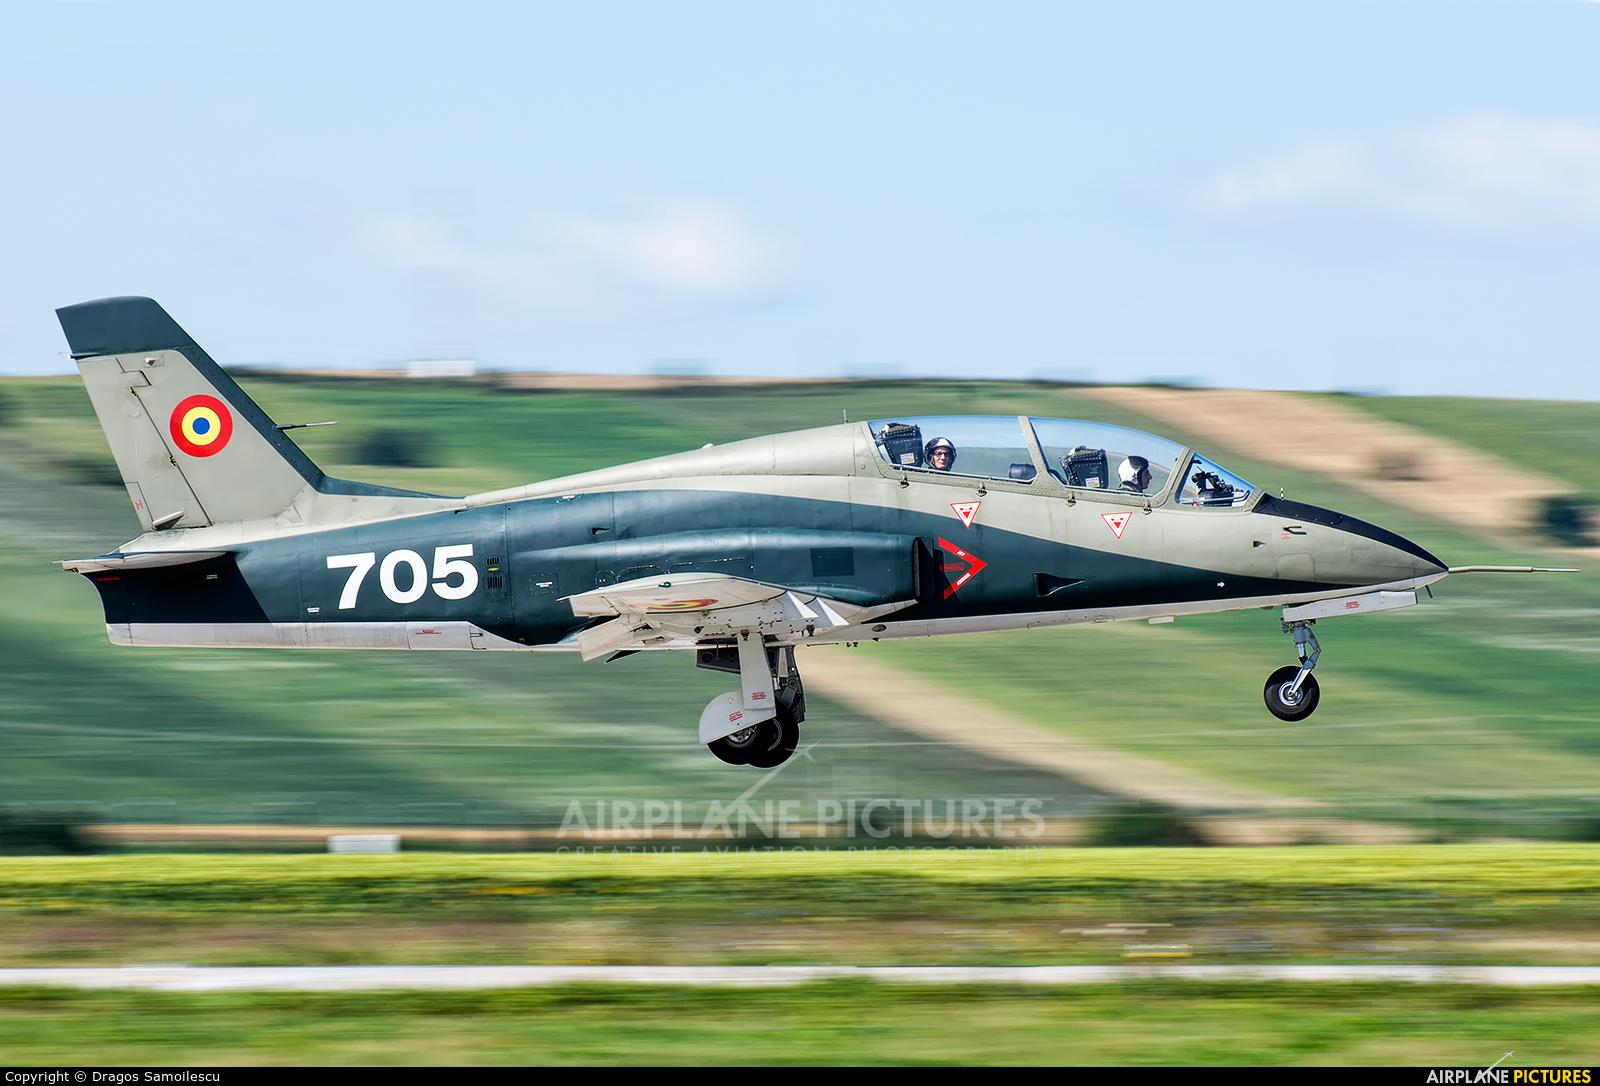 Romania - Air Force 705 aircraft at Câmpia Turzii